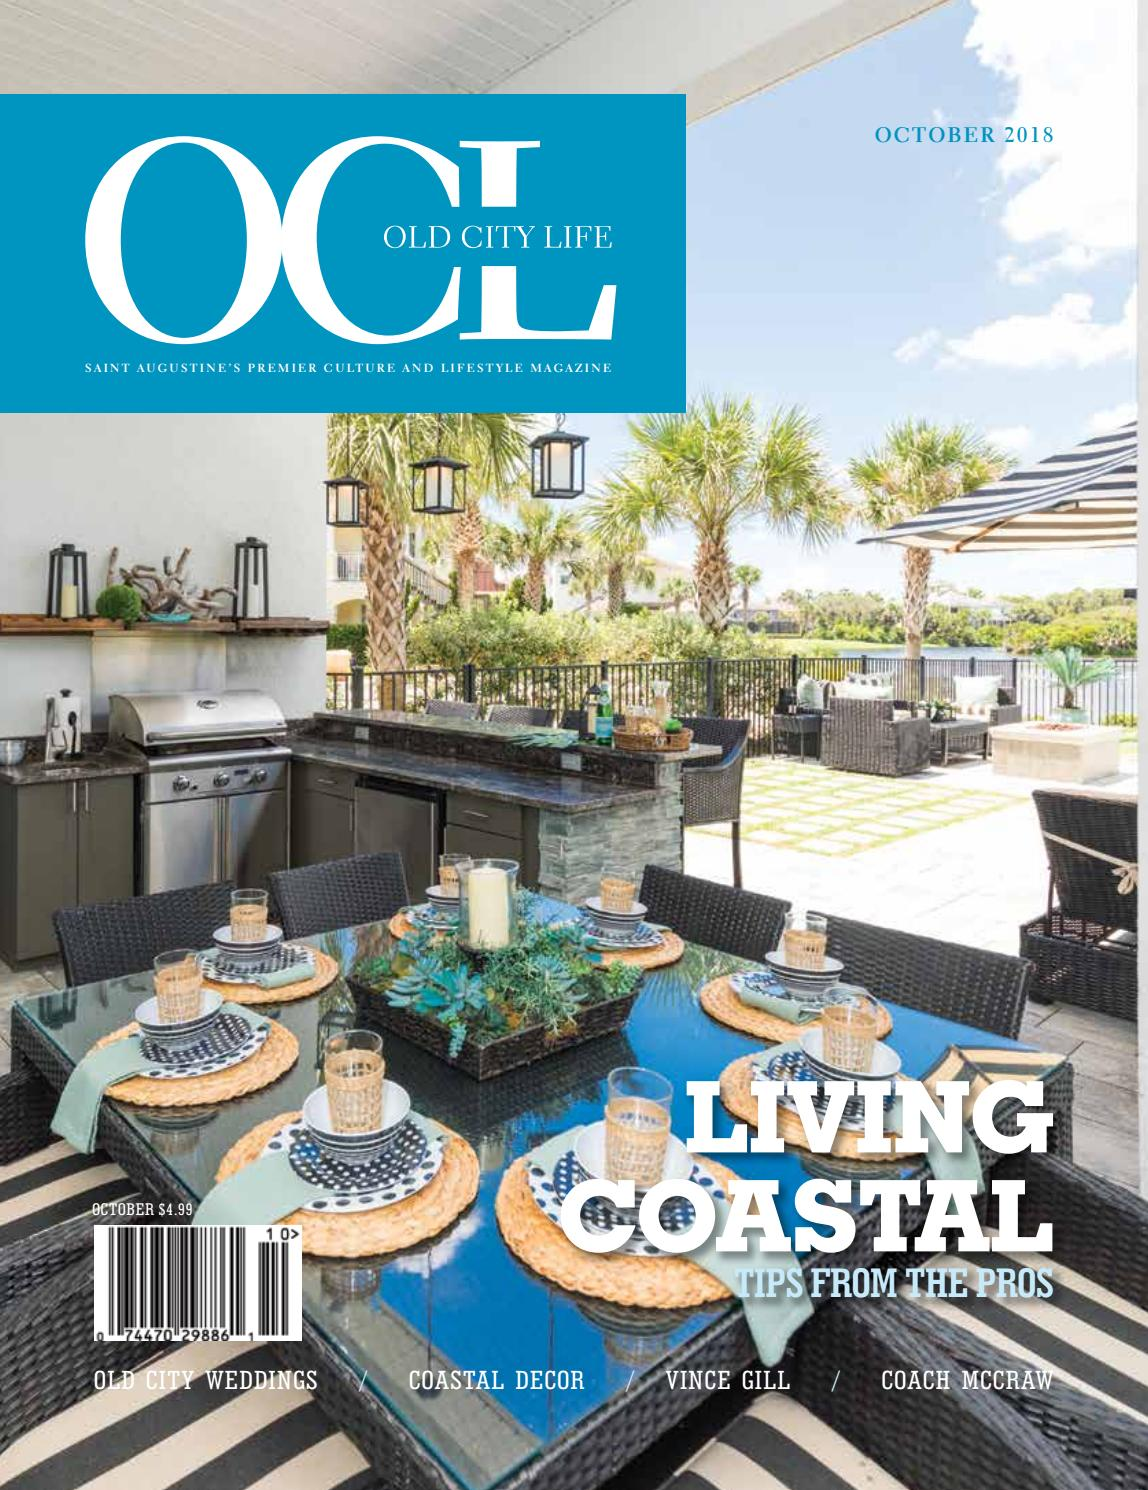 Old City Life Magazine October 2018 Issue By Castaway Publishing Inc Issuu